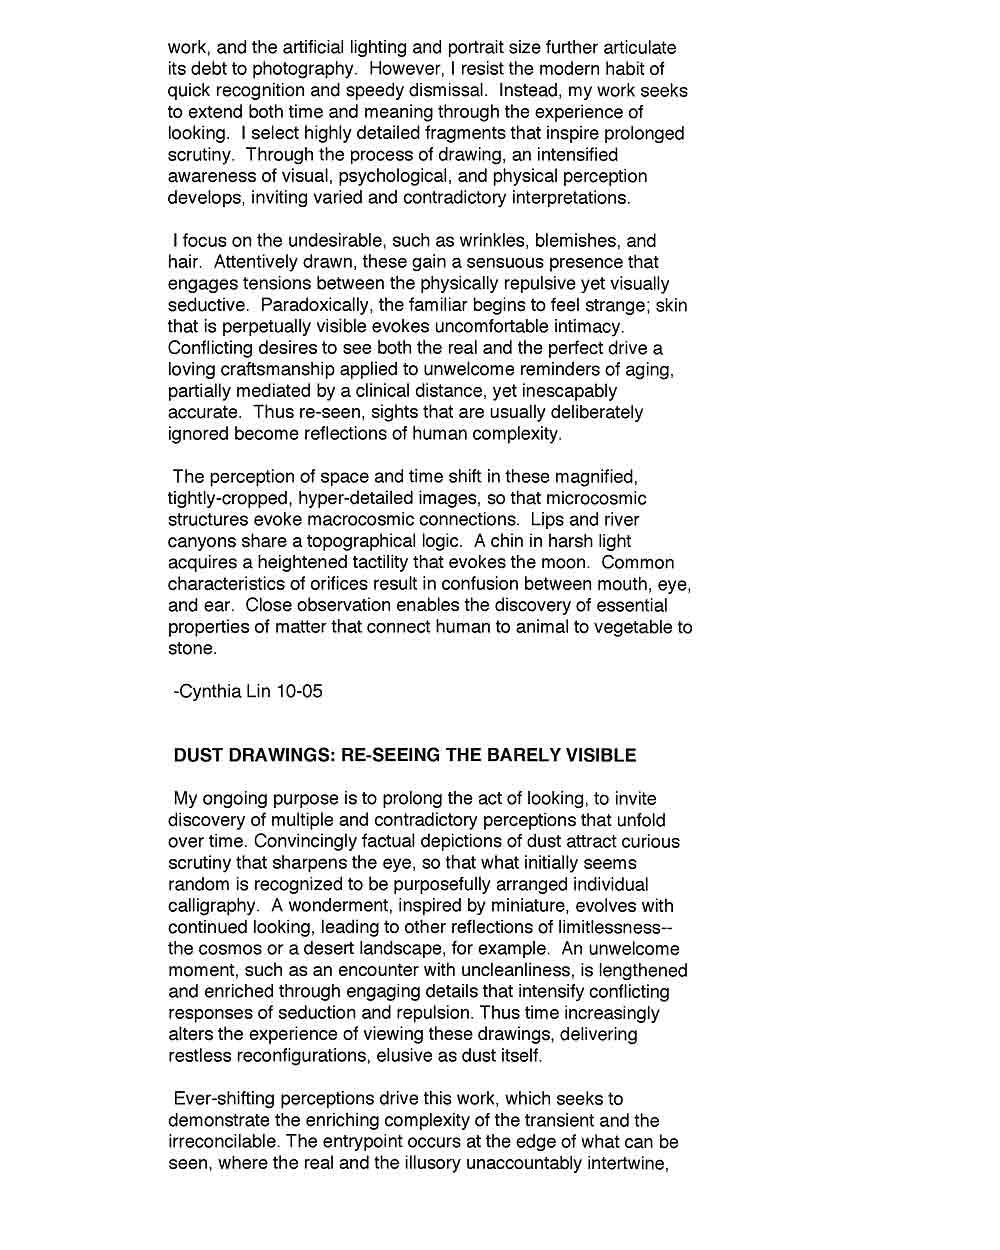 Cynthia Lin's Artist Statement (2), pg 2